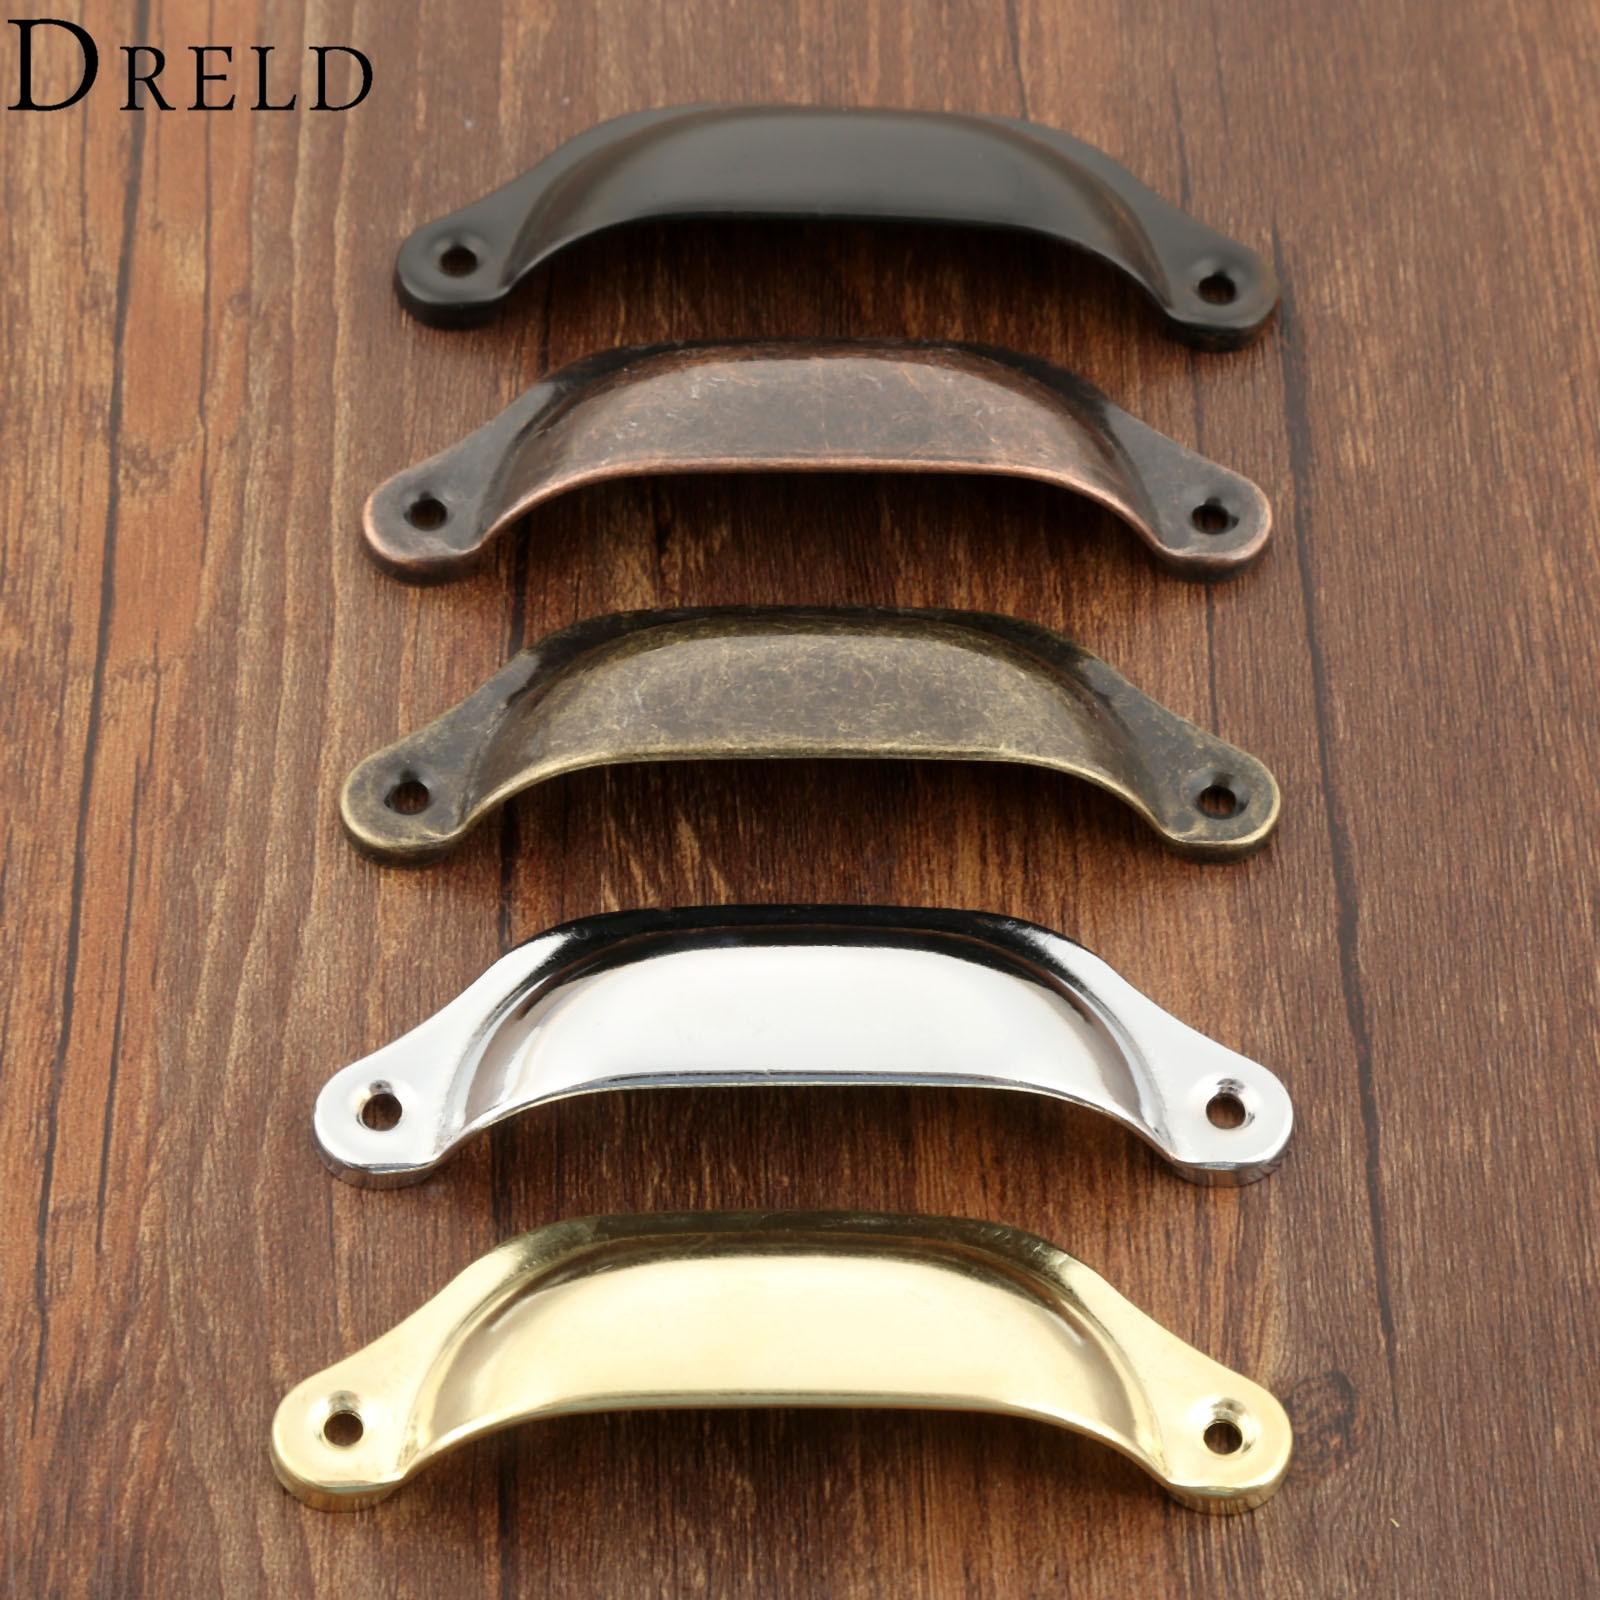 95mm Long Cupboard Dresser Door Hardware Metal Pull Handles Silver Tone 20Pcs